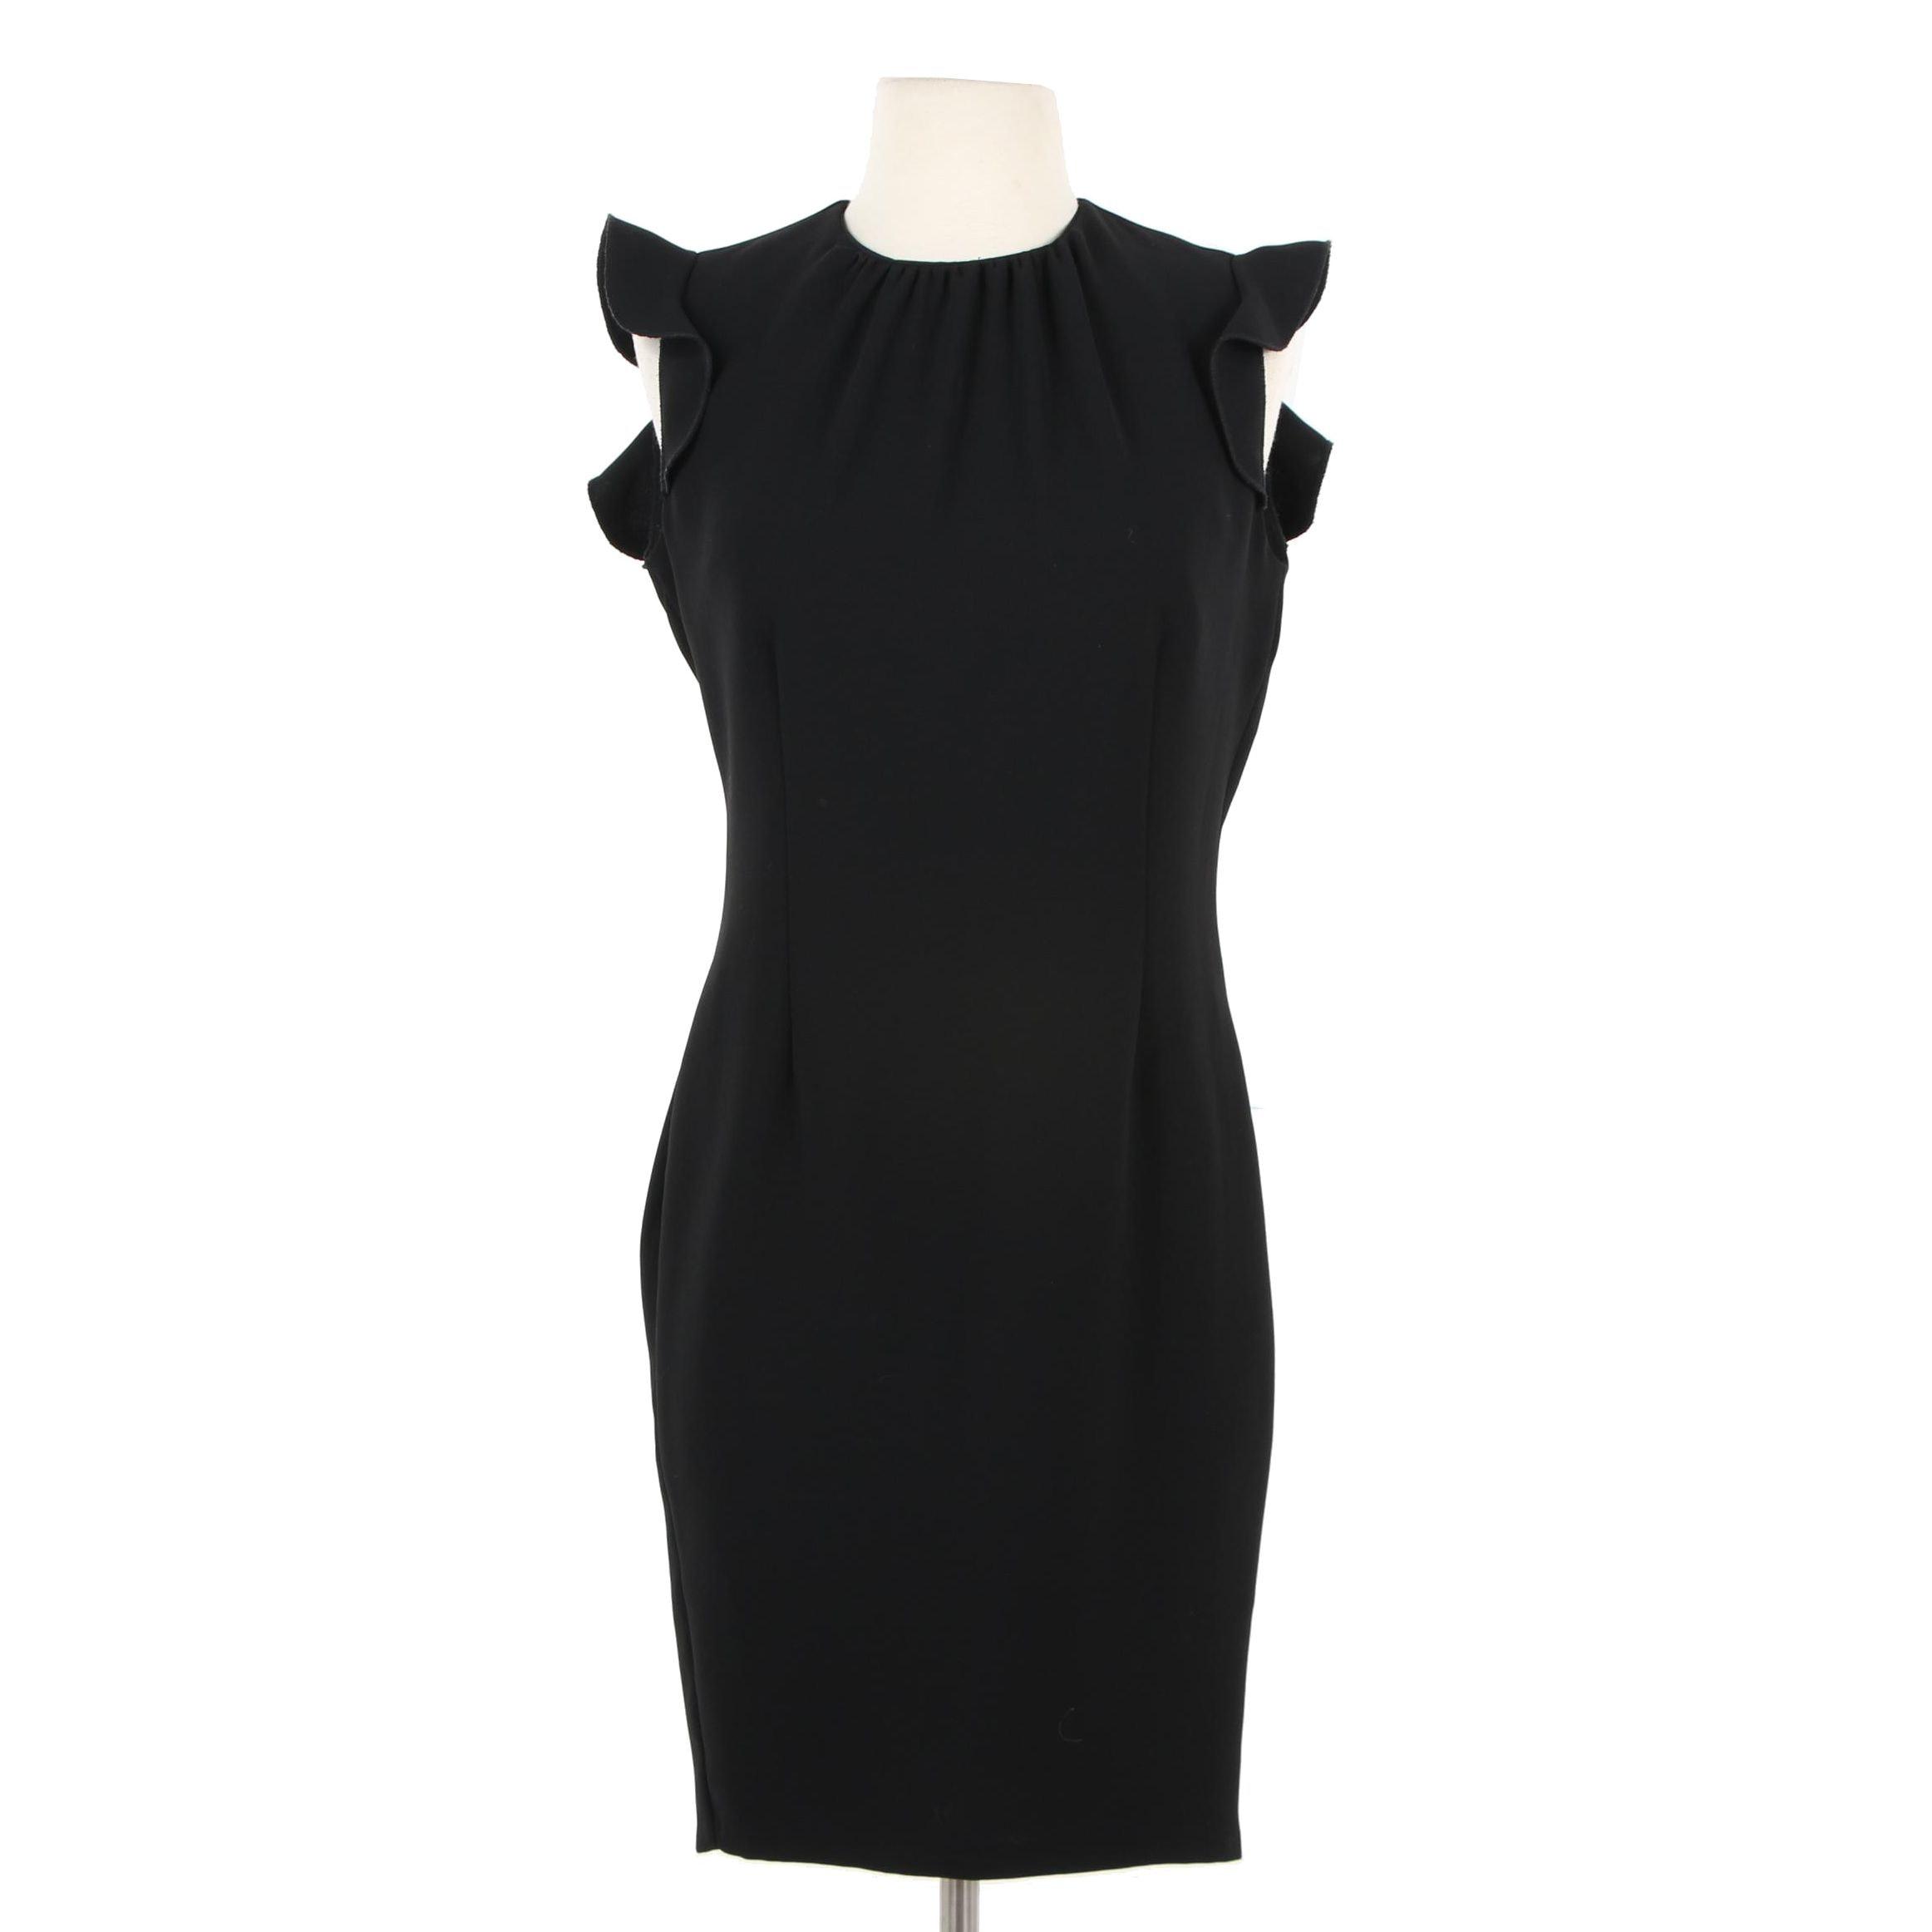 Rinascimento Black Prima Linea Sheath Dress